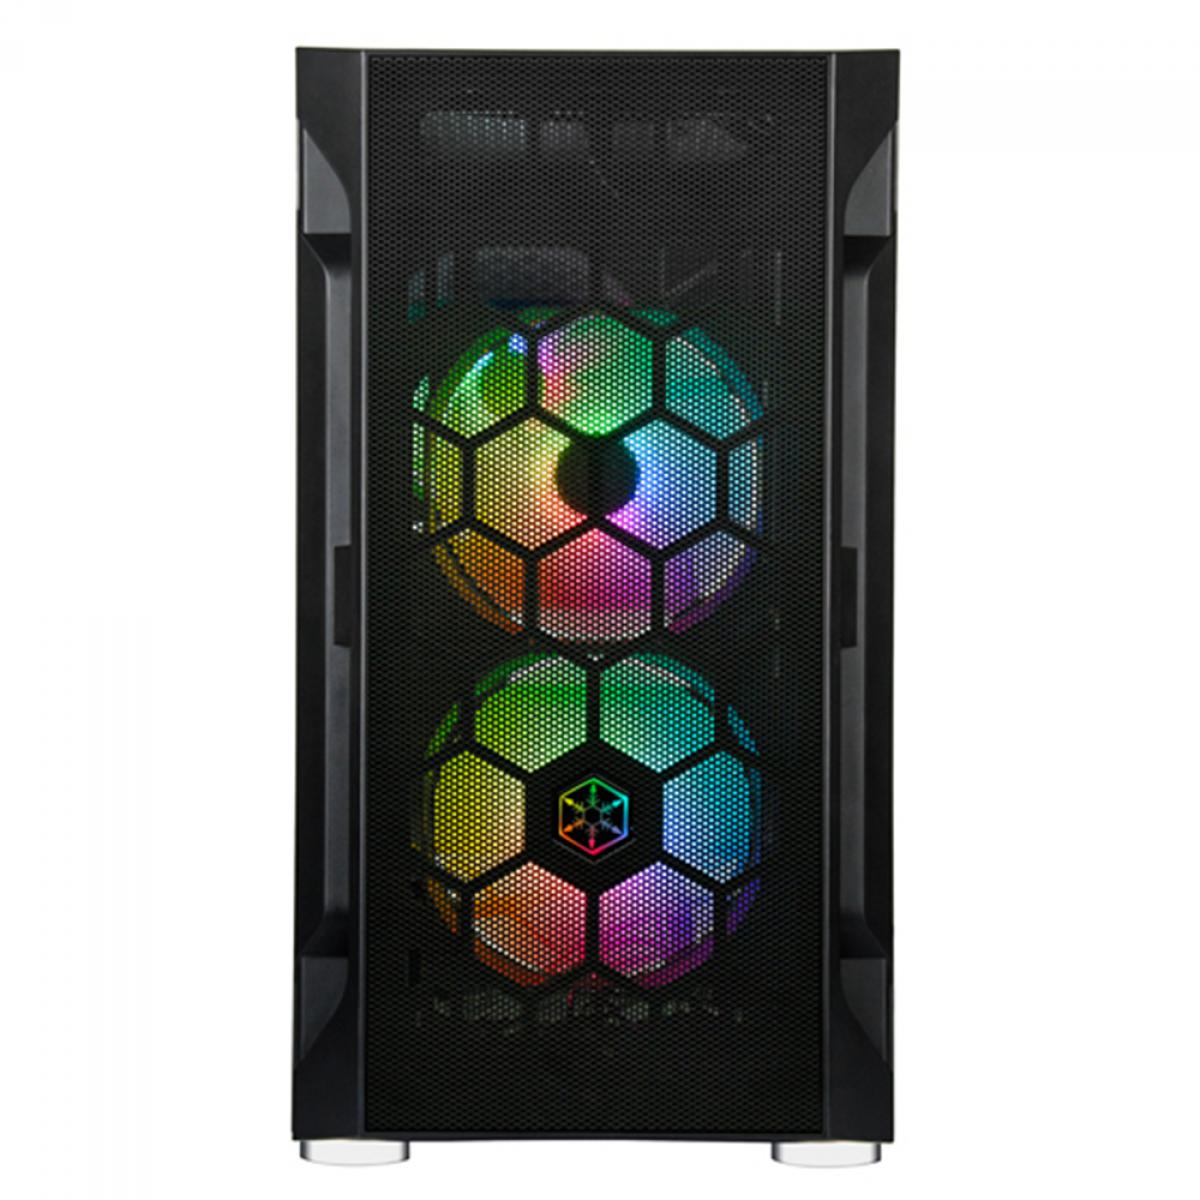 Gabinete Gamer SilverStone Fara H1M PRO, Mini Tower, RGB, Vidro Temperado, Black, Micro-ATX, Sem Fonte, Com 3 Fans ARGB, SST-FAH1MB-PRO